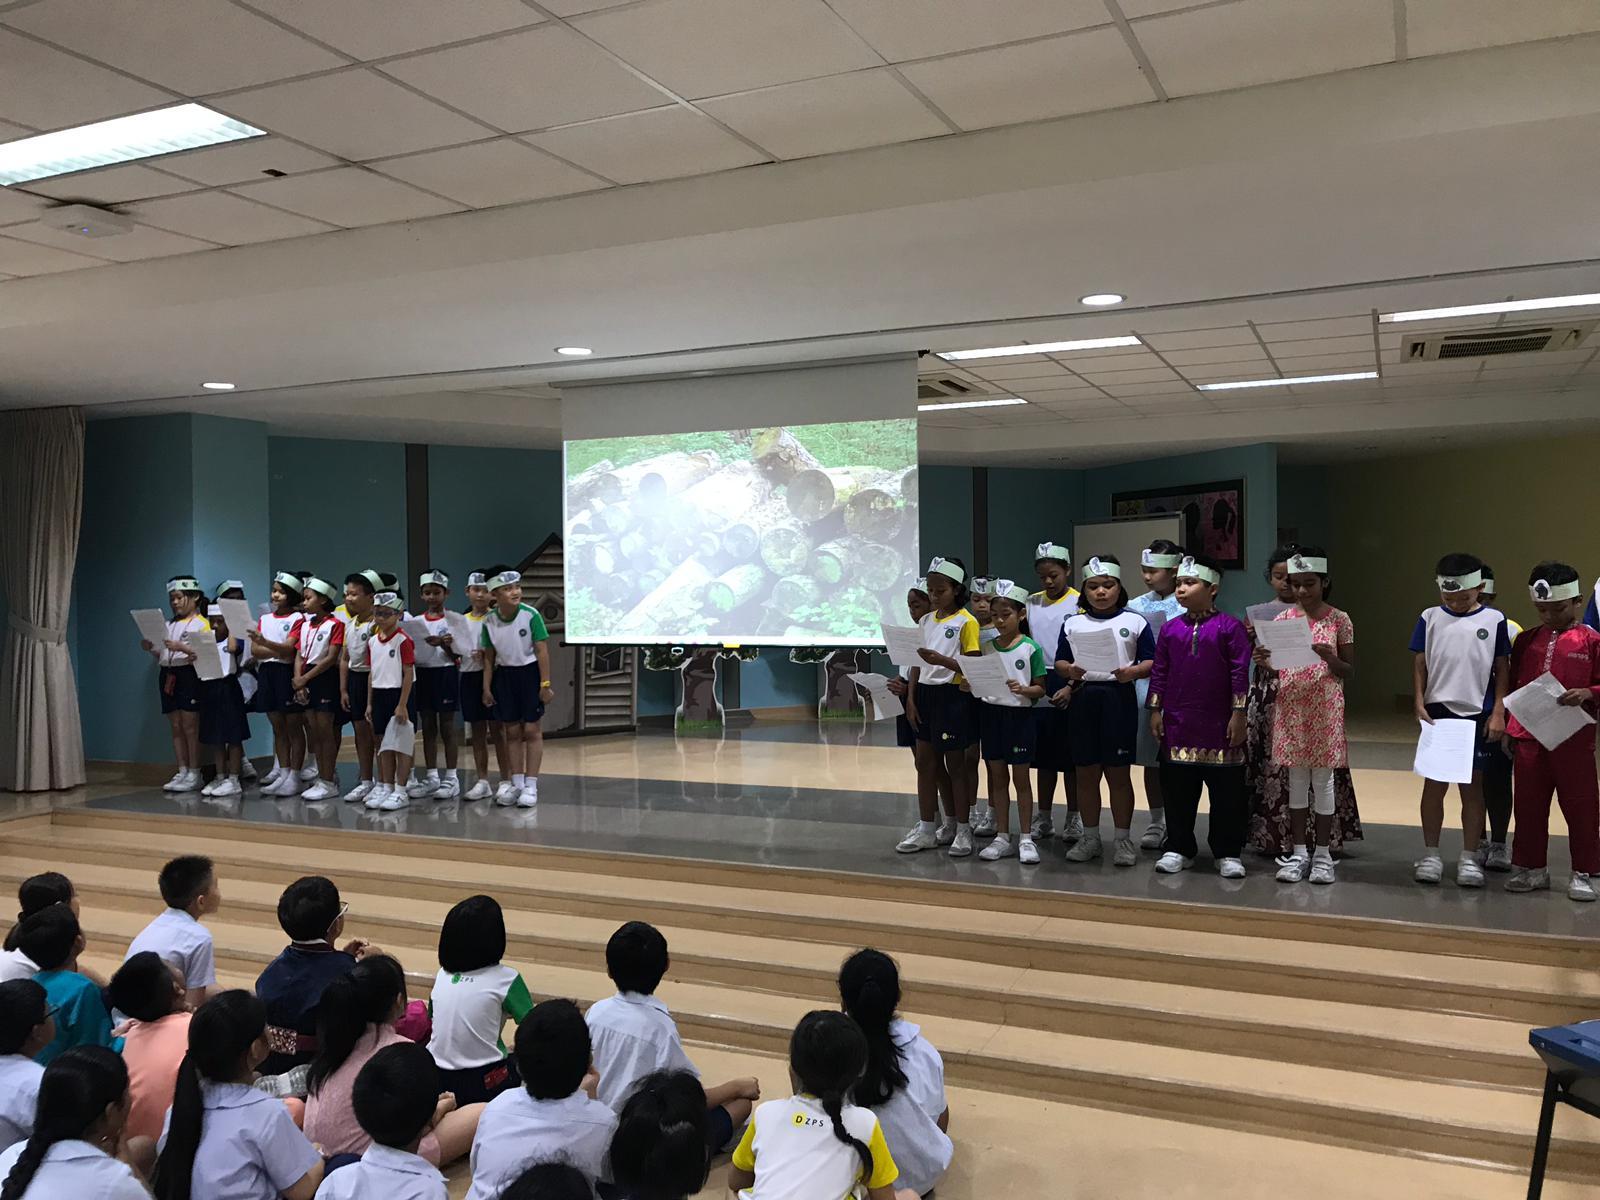 Dazhong Primary School